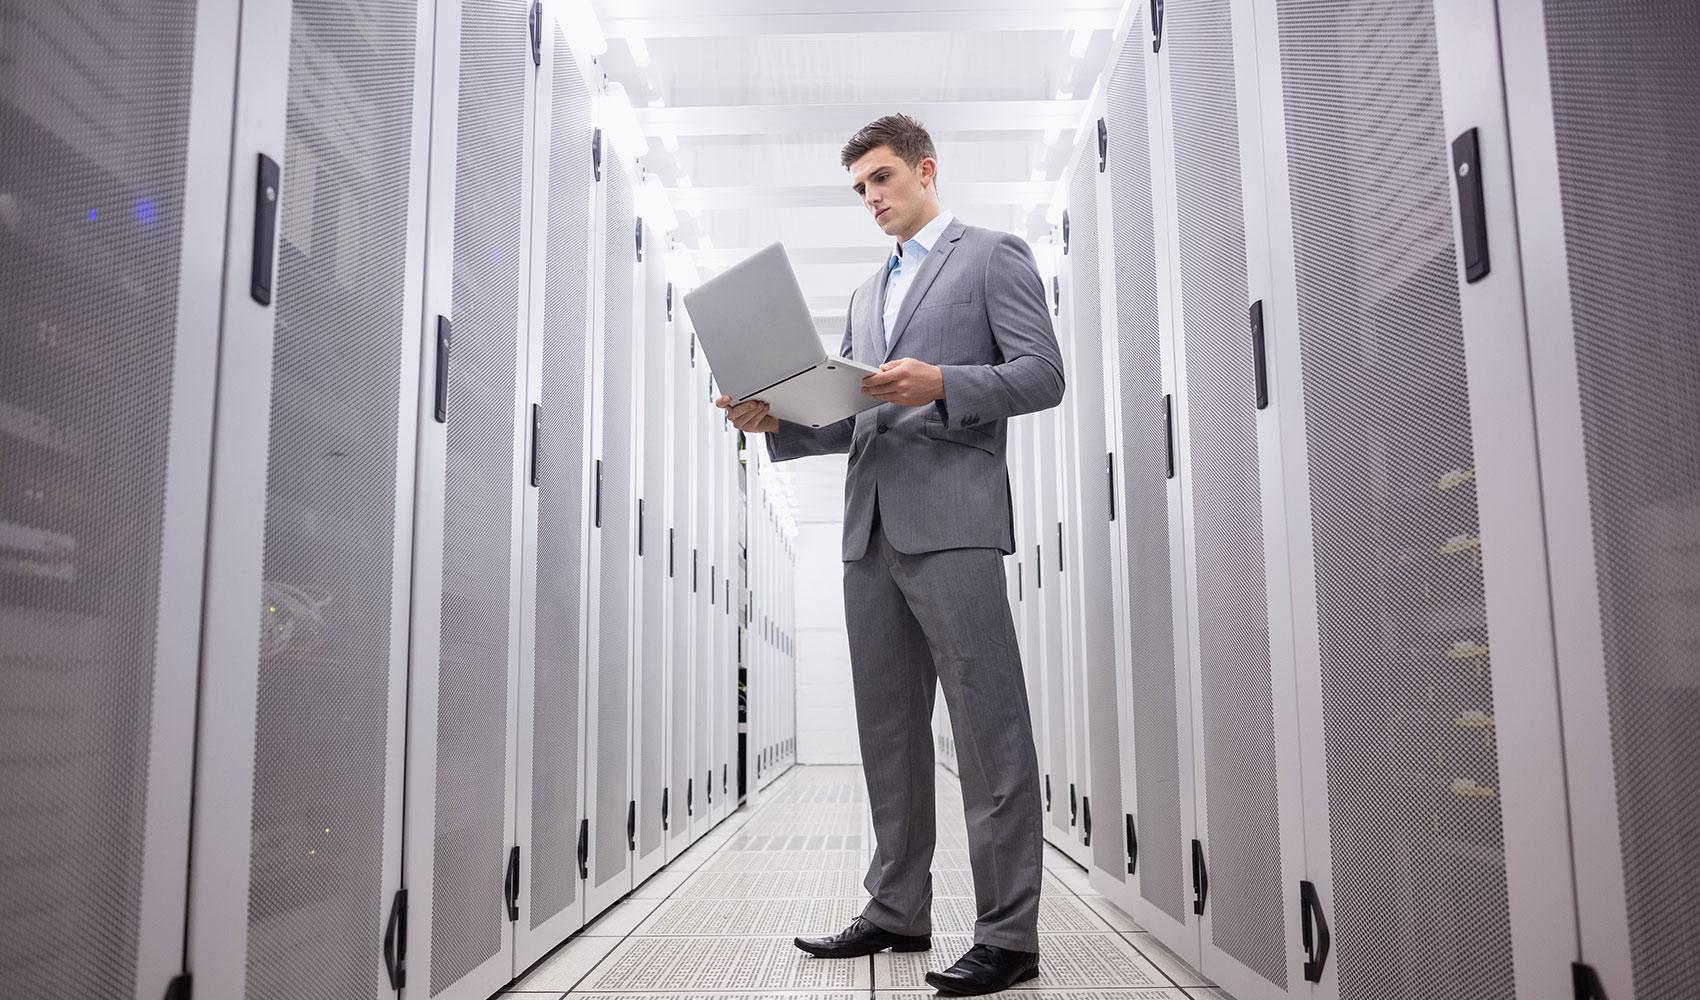 IBM-Planning-Analytics-Workspace-incompatibilité-entre-le-service-Docker-et-VMWare-Tools